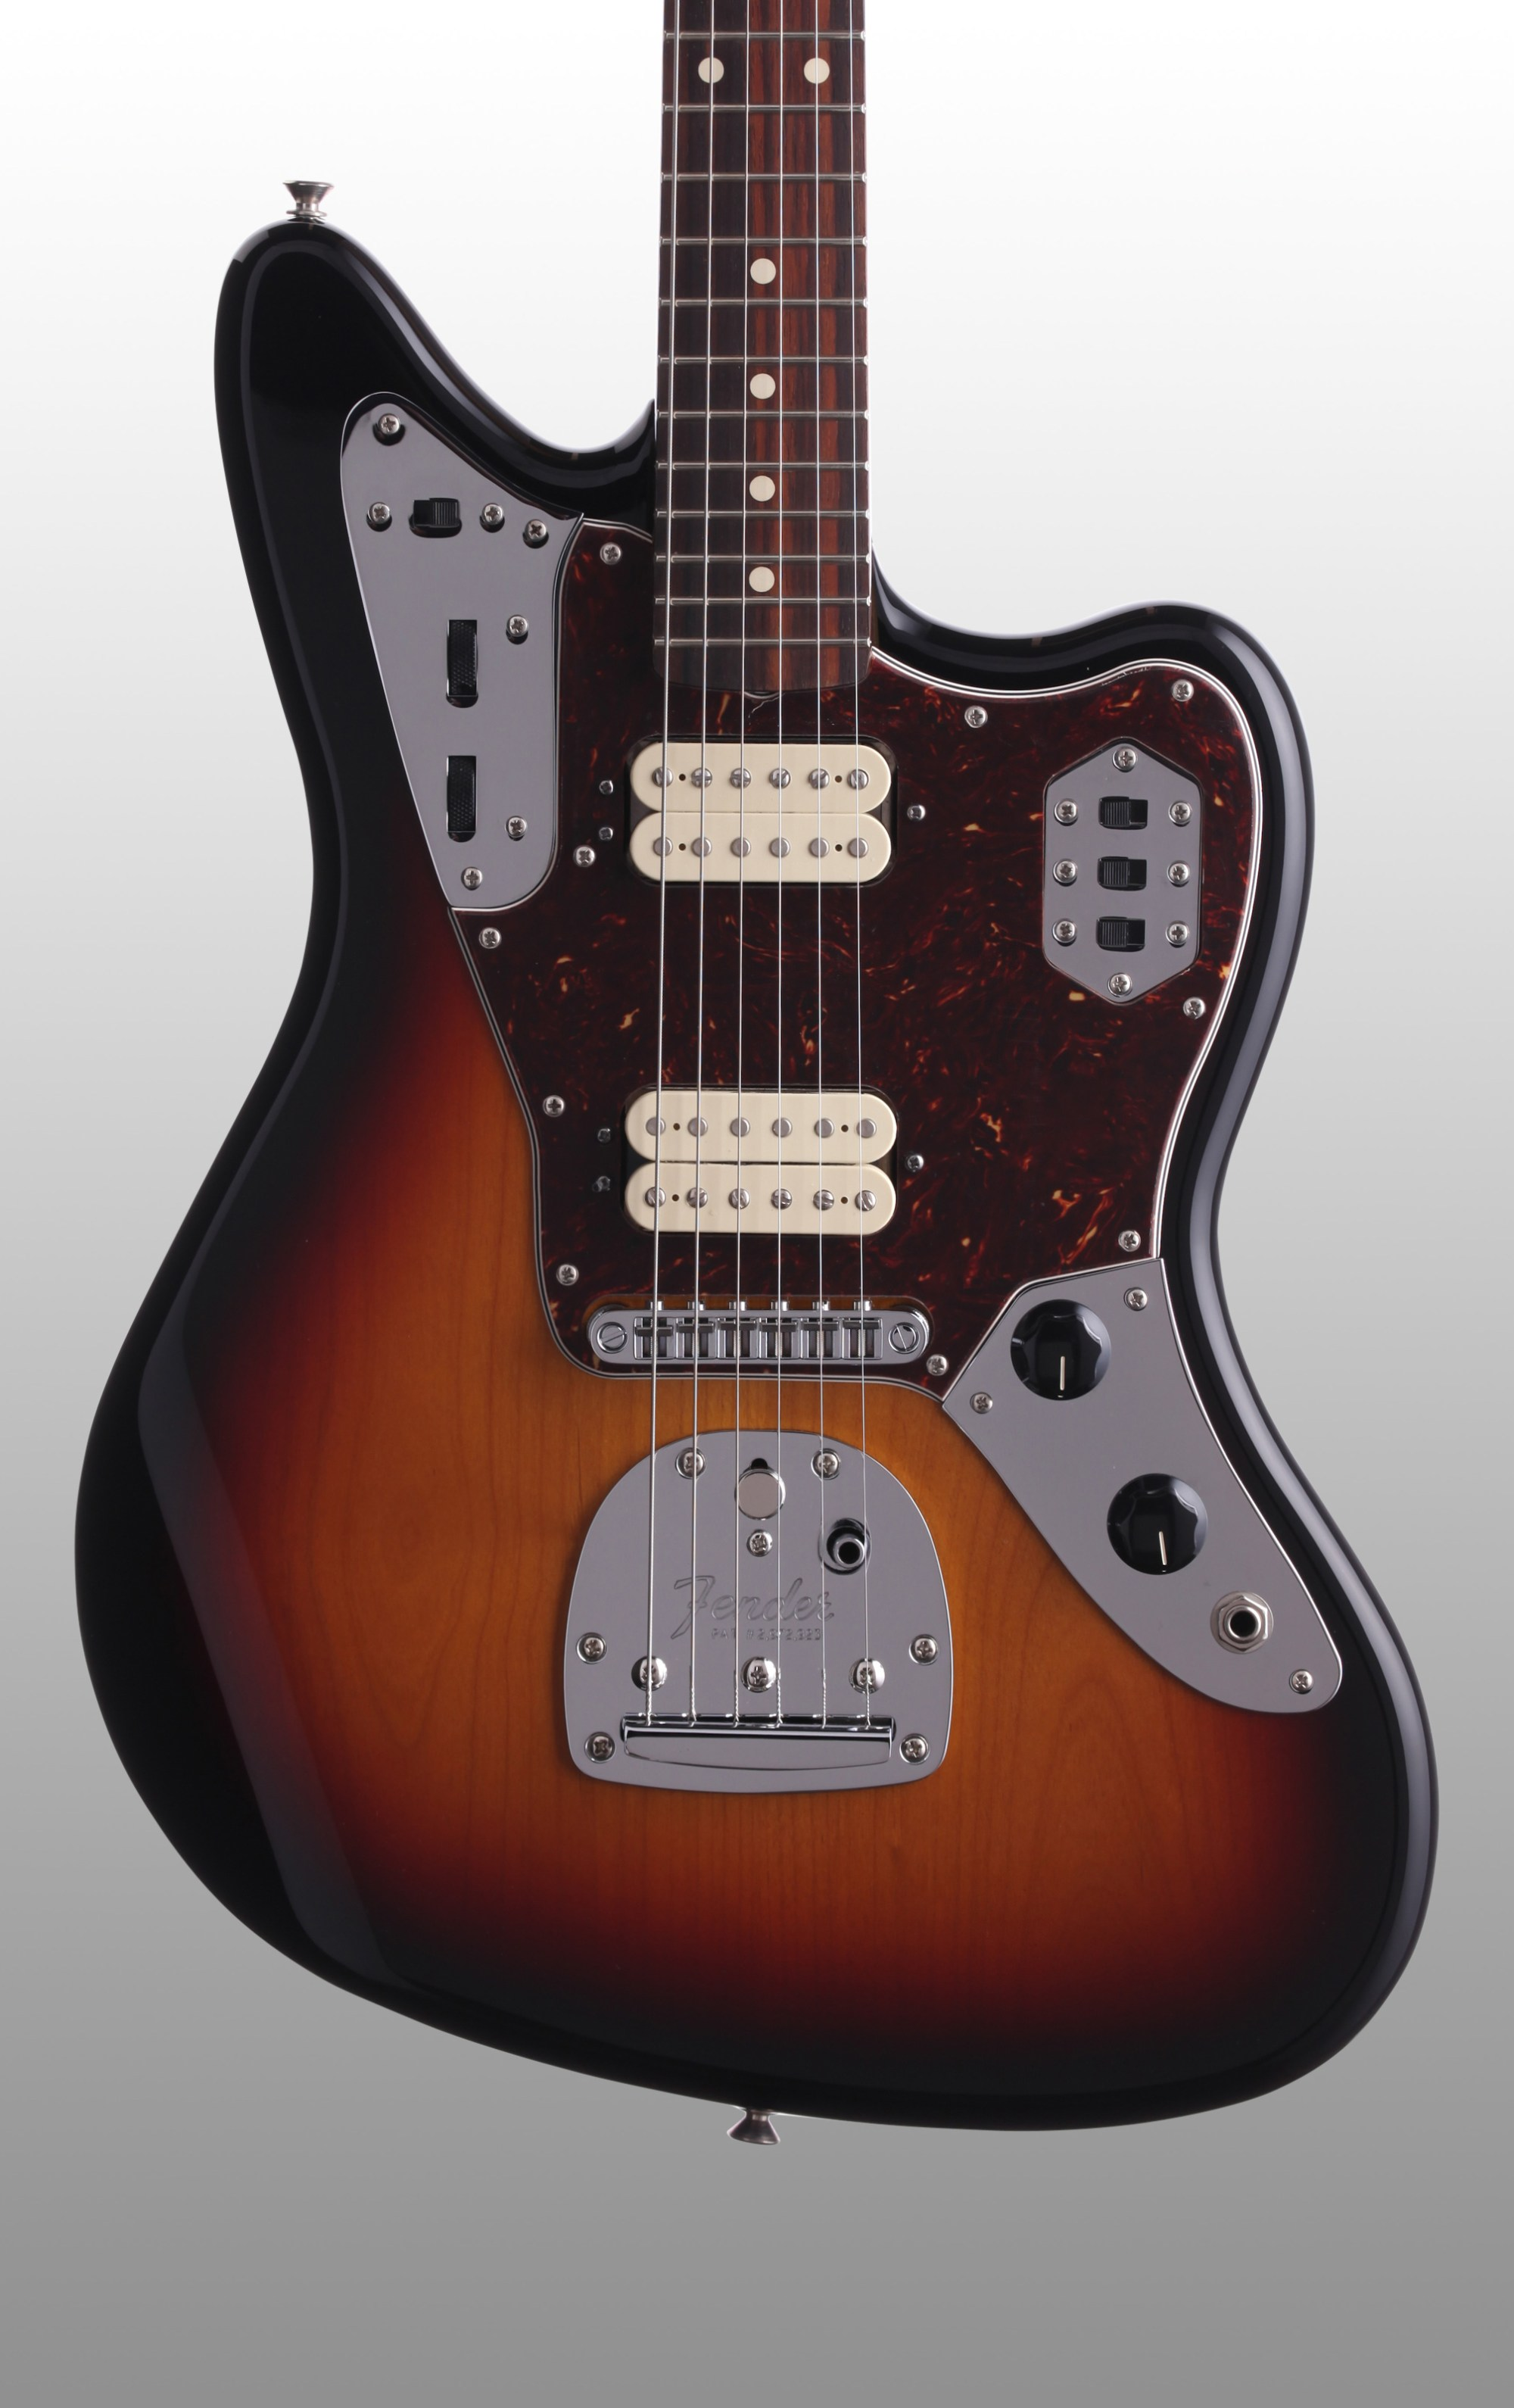 hight resolution of fender jaguar guitar wiring diagram in addition dishwasher air gap 6635d1350101660110ccbasicwiringsetup5wirelifanwiring041605